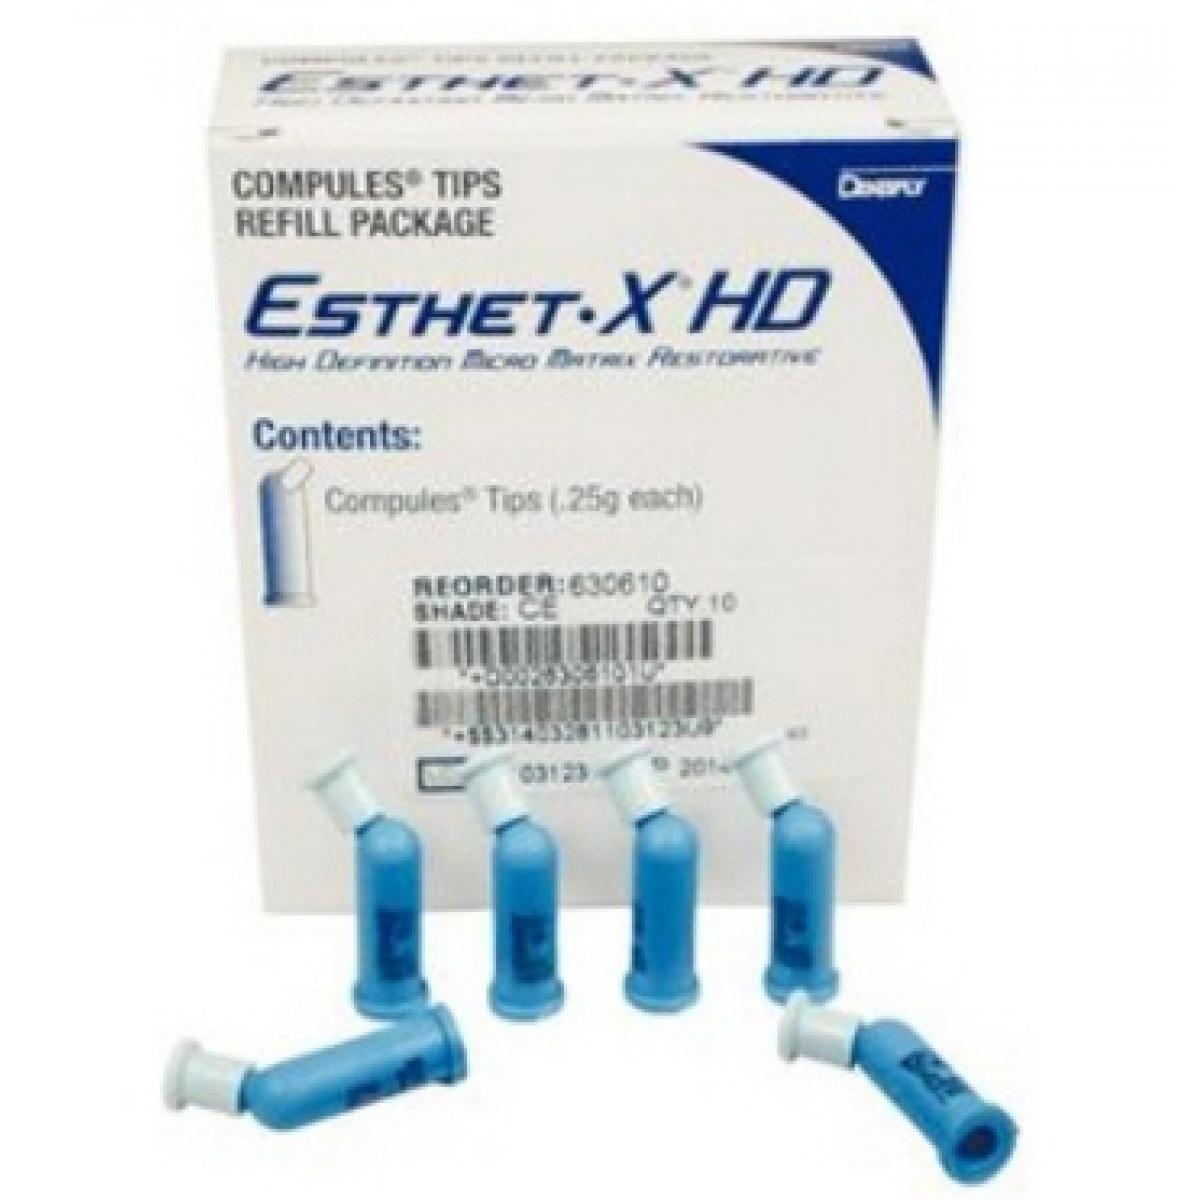 ESTHET XD CLEAR E COMPULES 10U DENTSPLY -